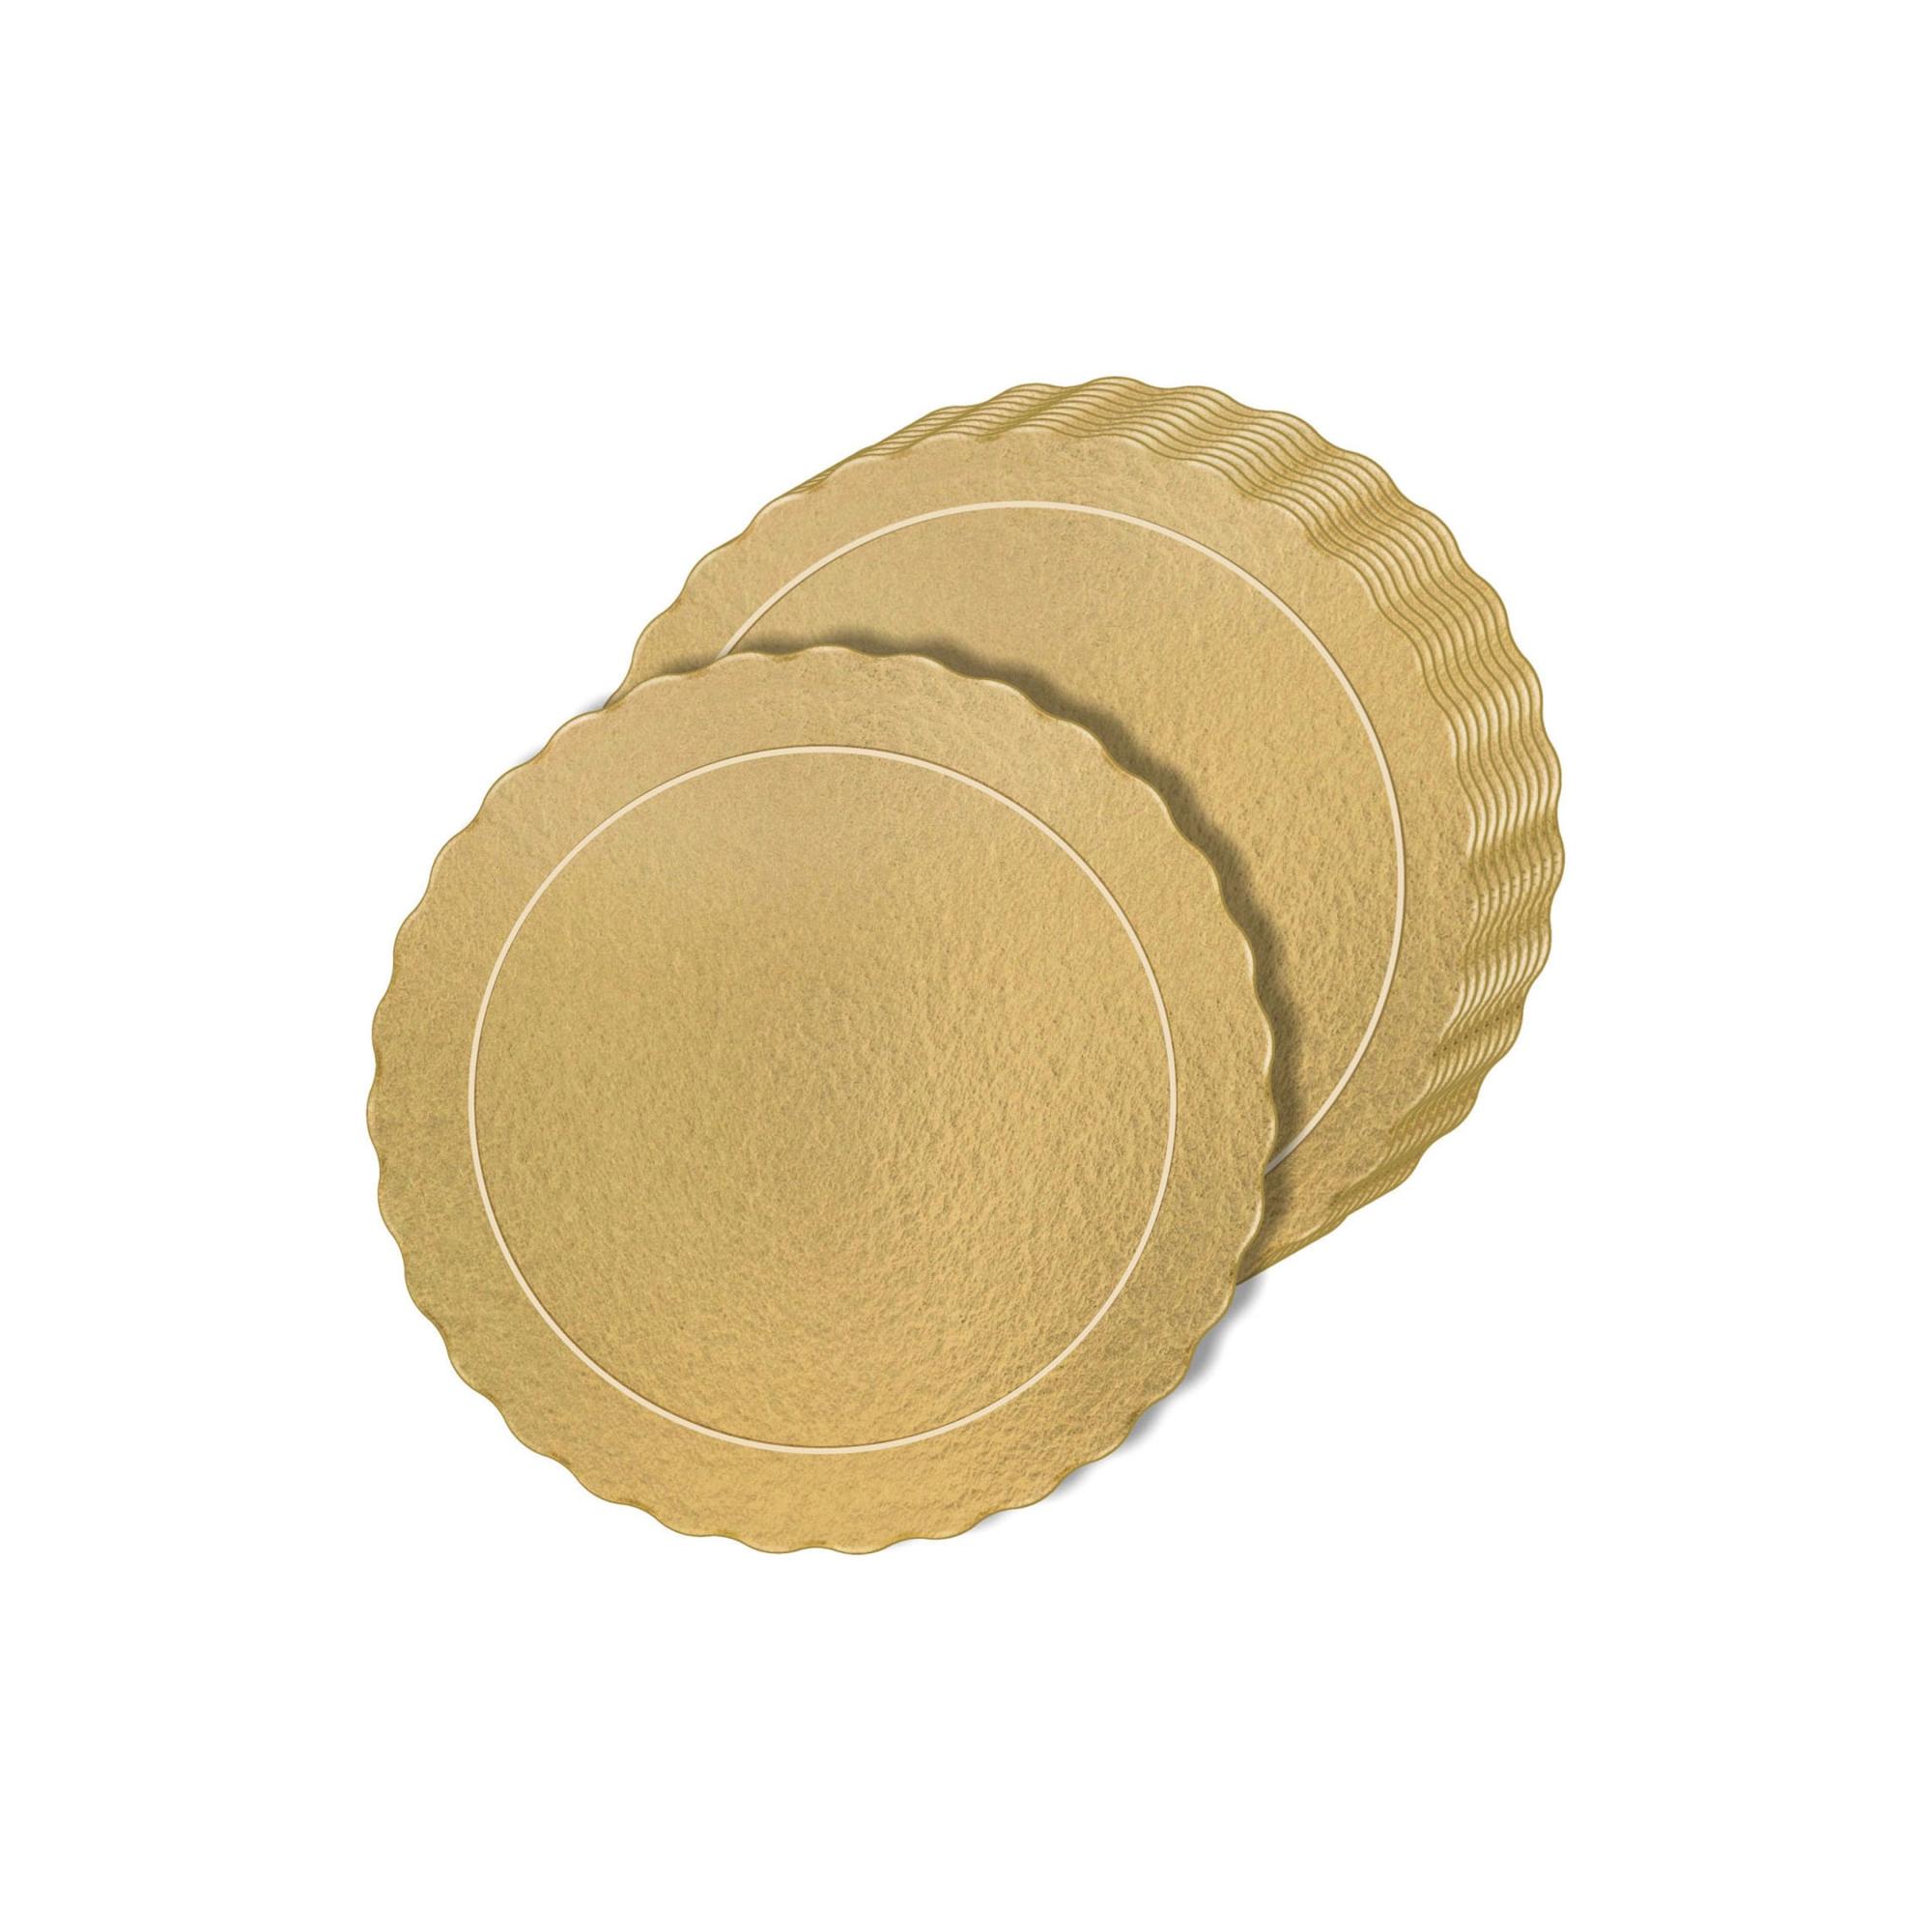 50 Bases Laminadas, Suporte P/ Bolo, Cake Board, 23cm - Ouro